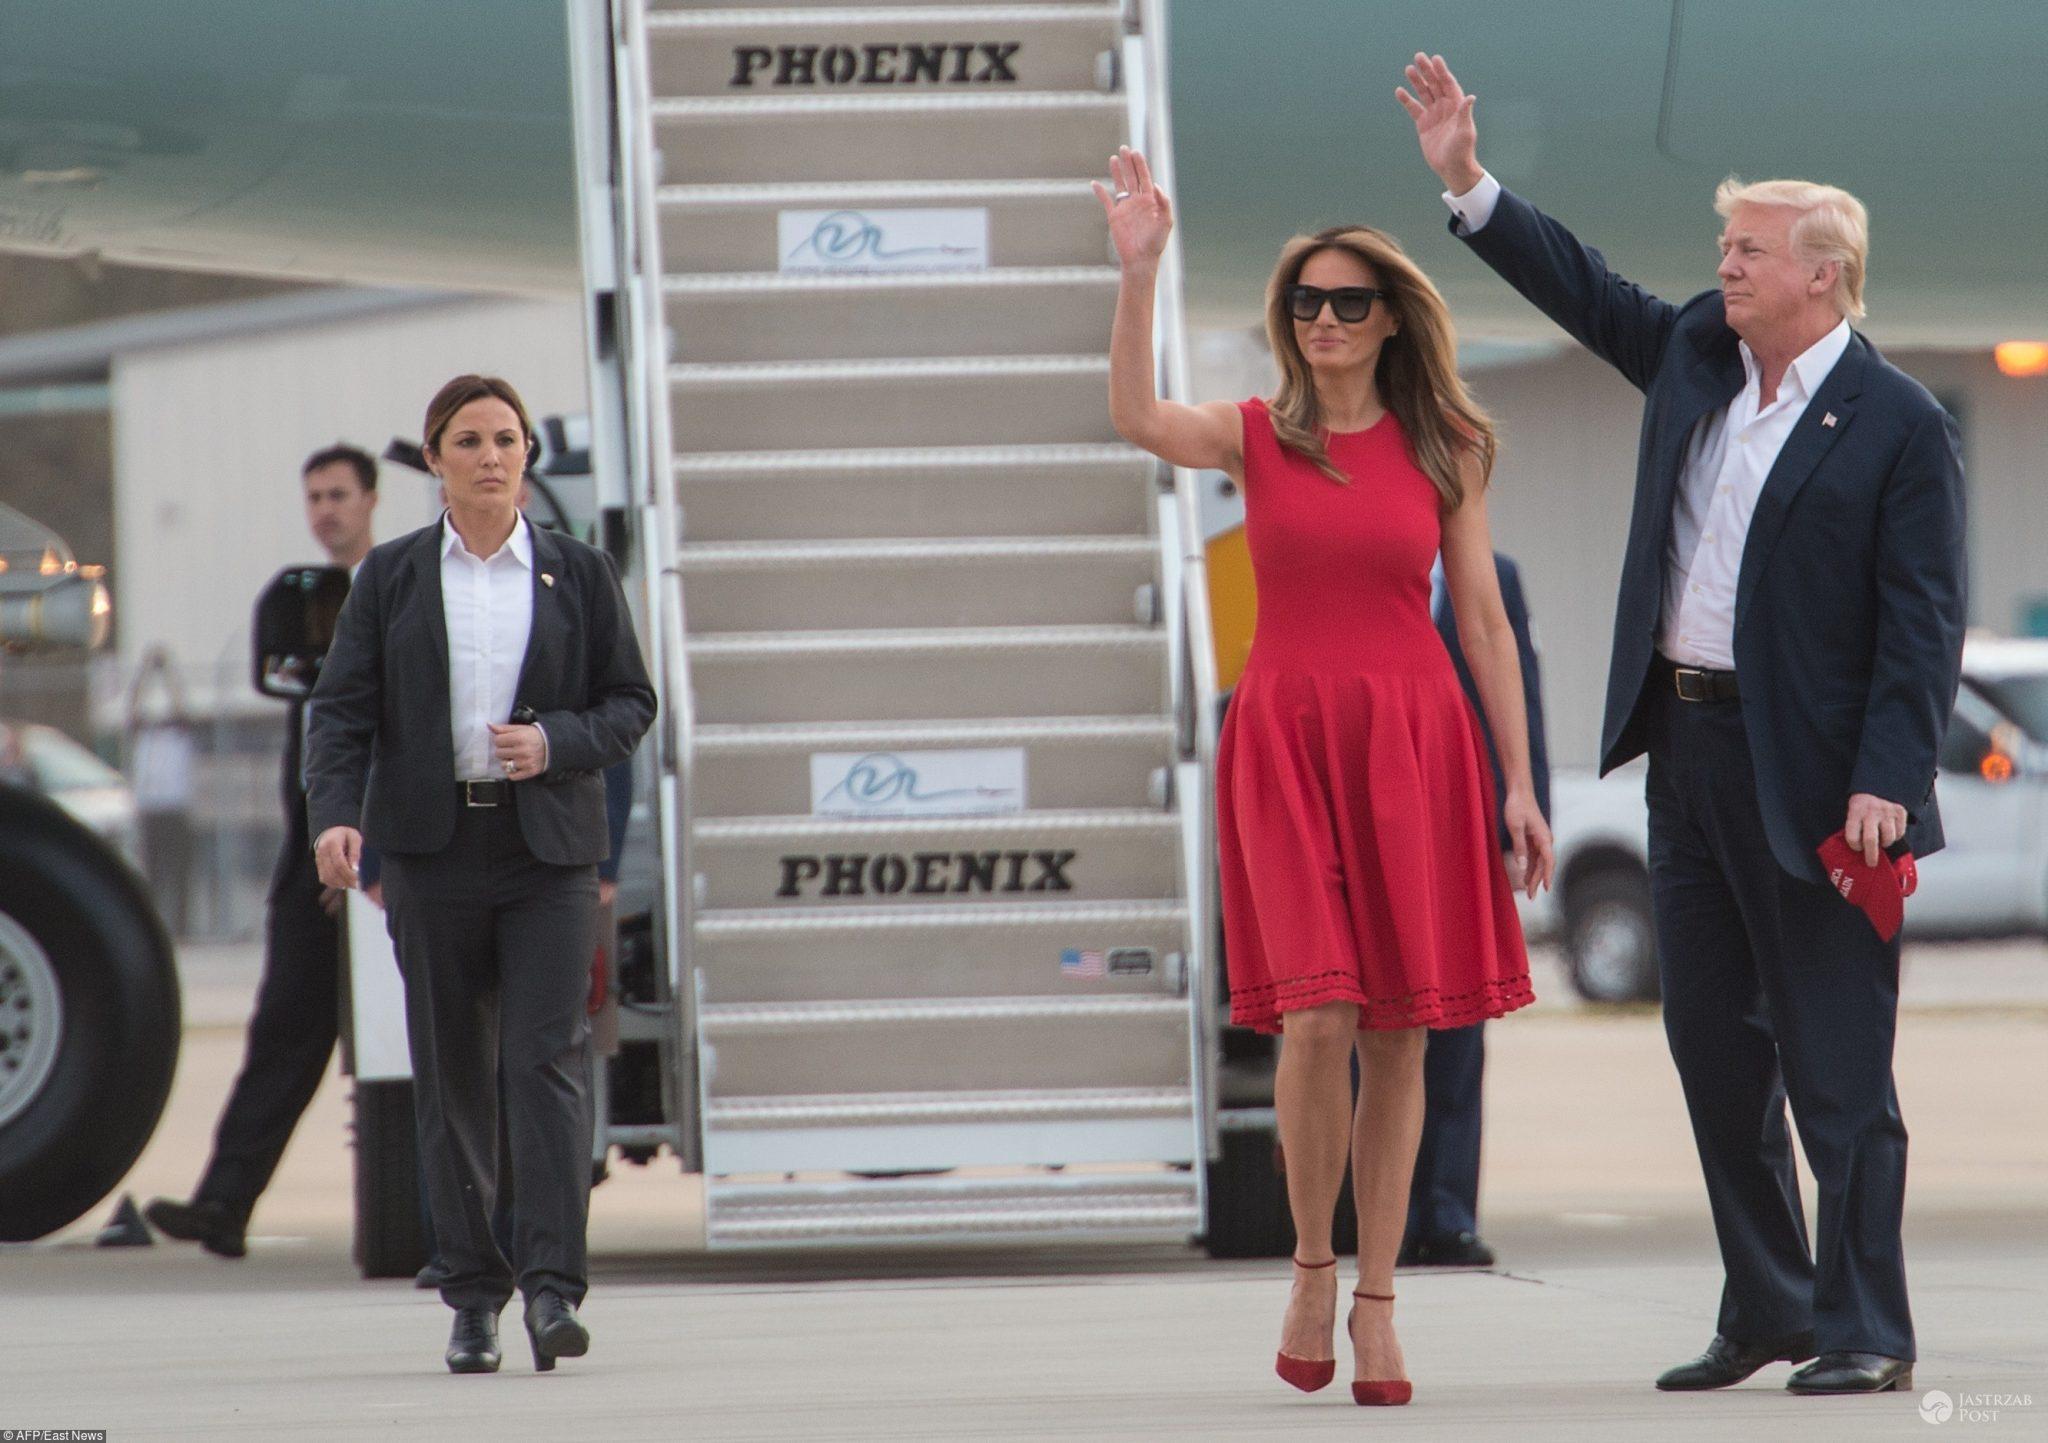 Melania Trump w obcisłej sukience